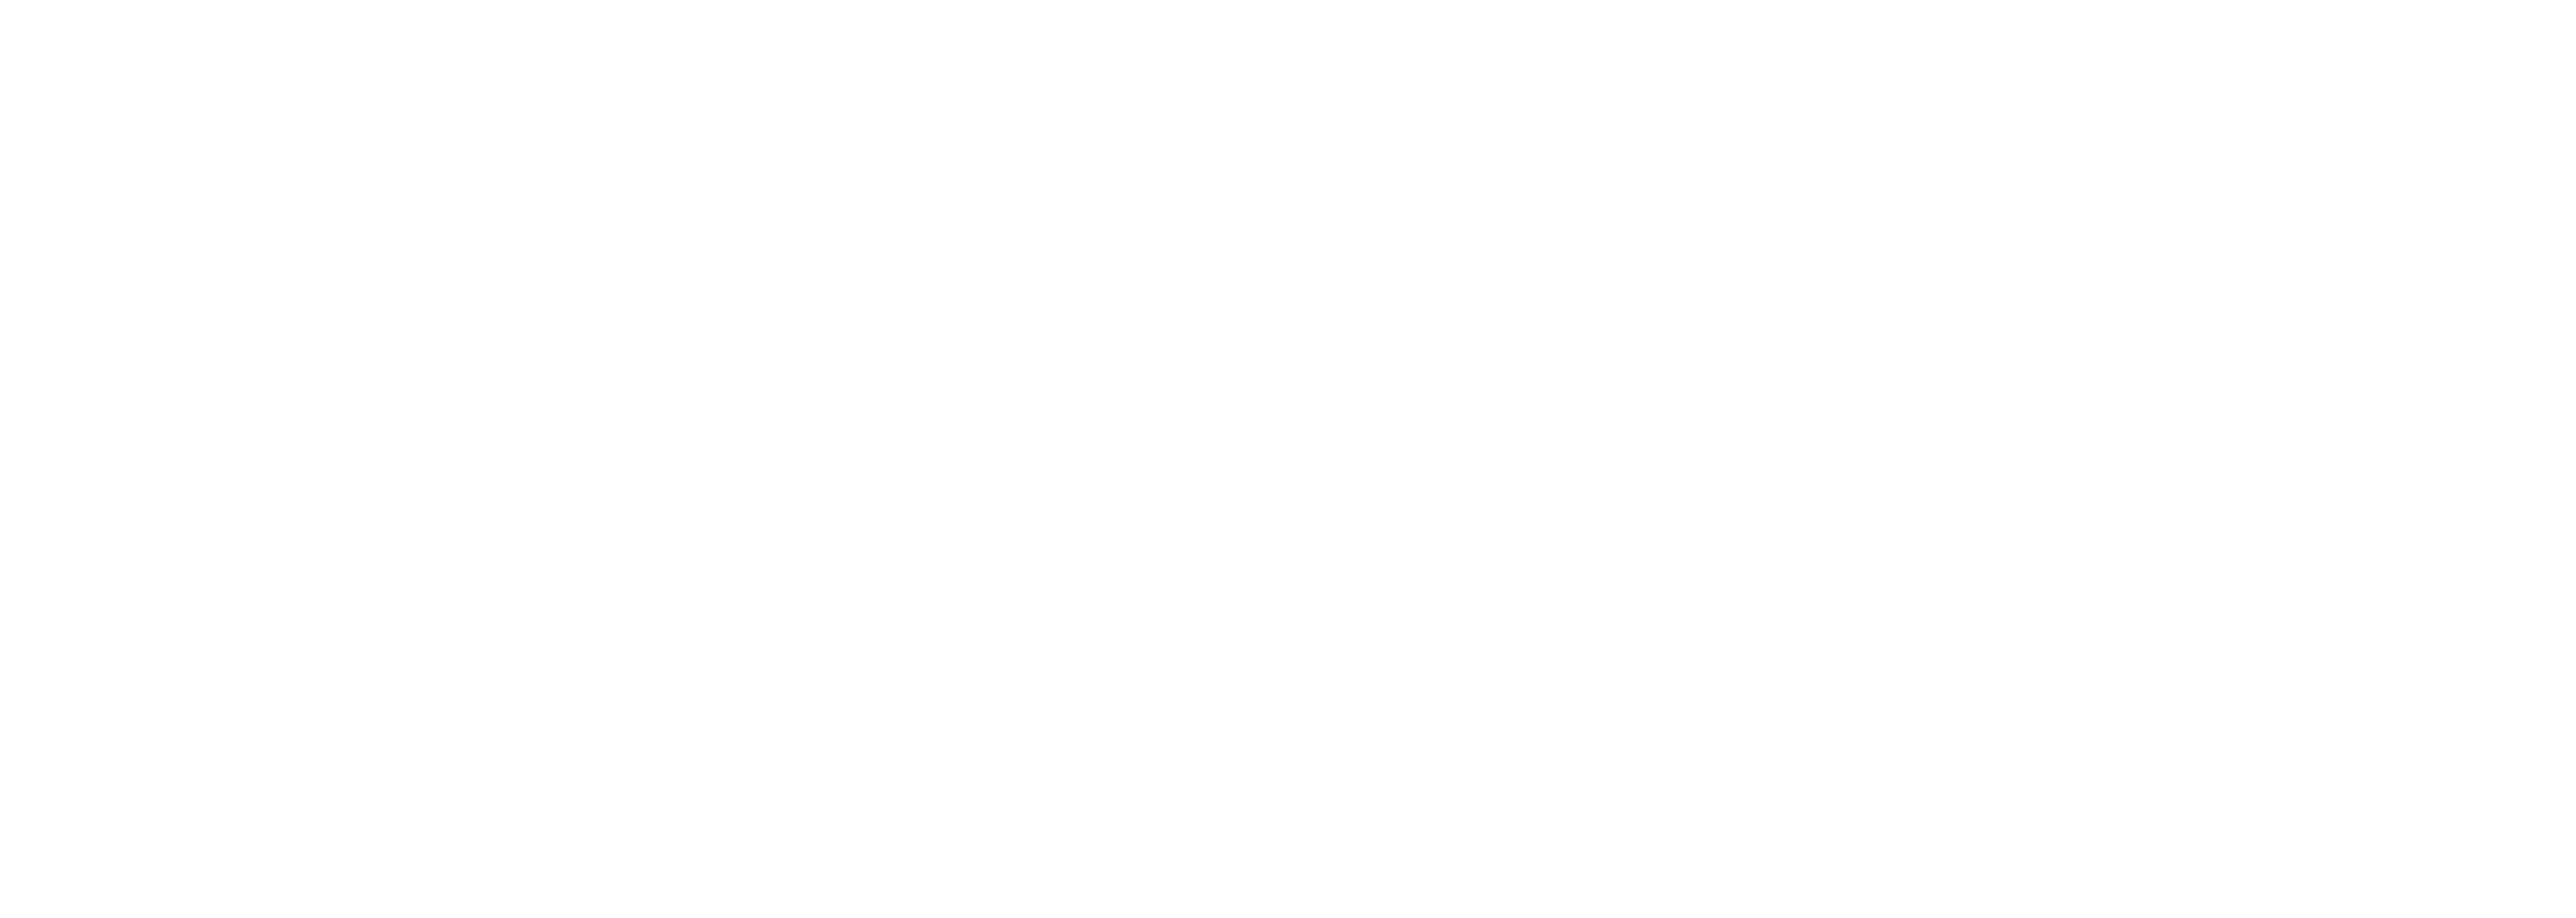 LOGO CONEICC 2020